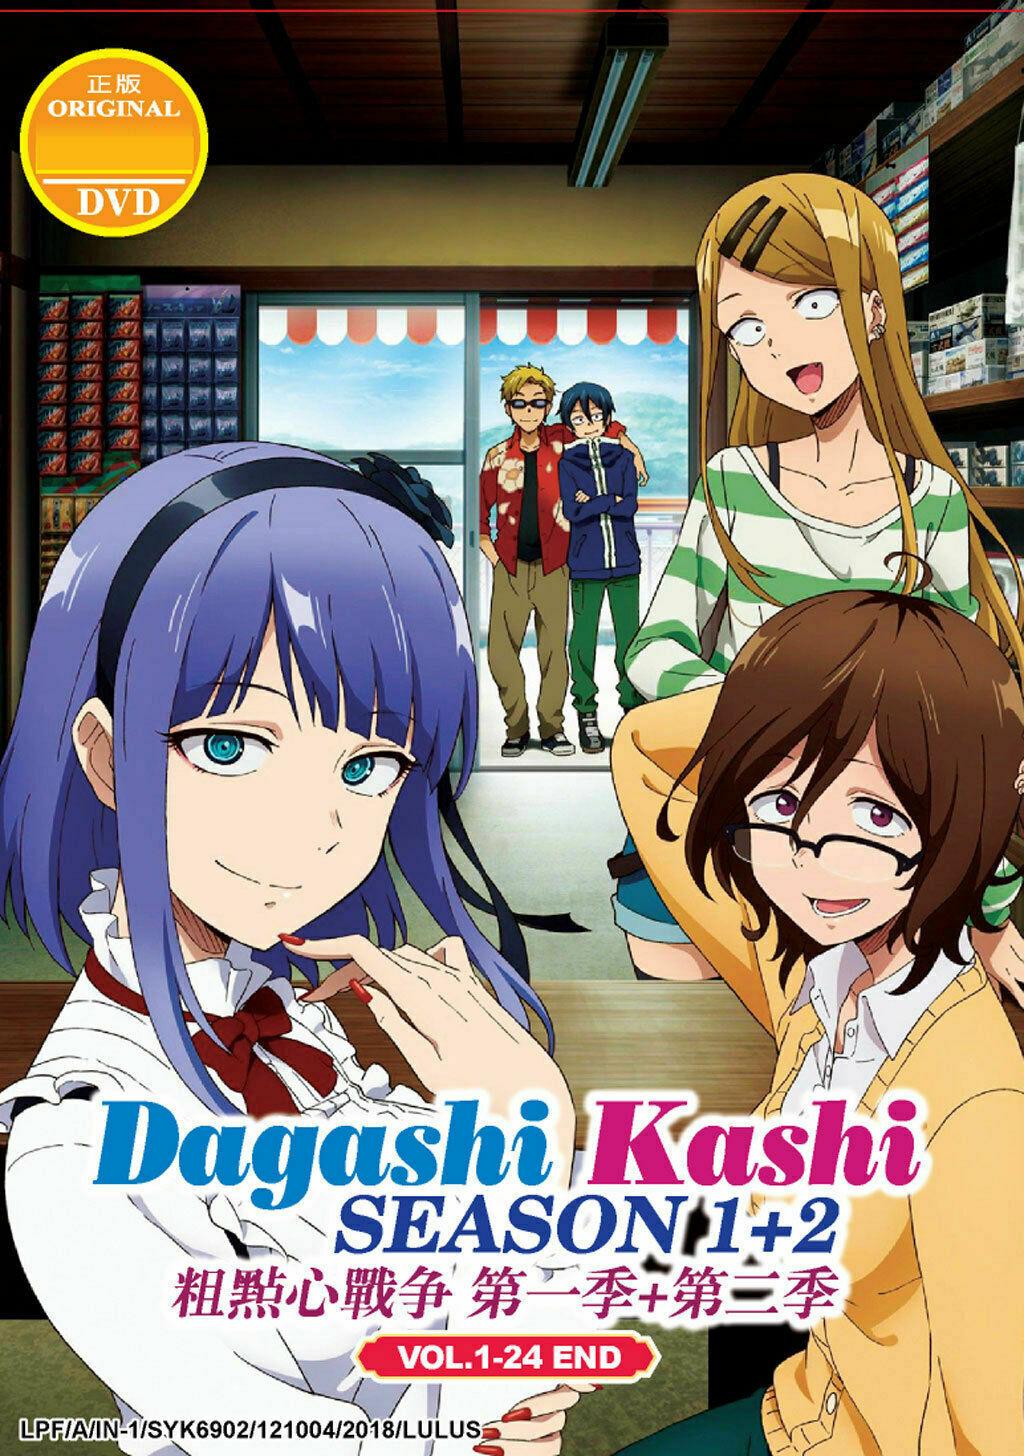 Dagashi Kashi DVD Complete Season 1 & 2 (1-24) English DUB Ship From USA